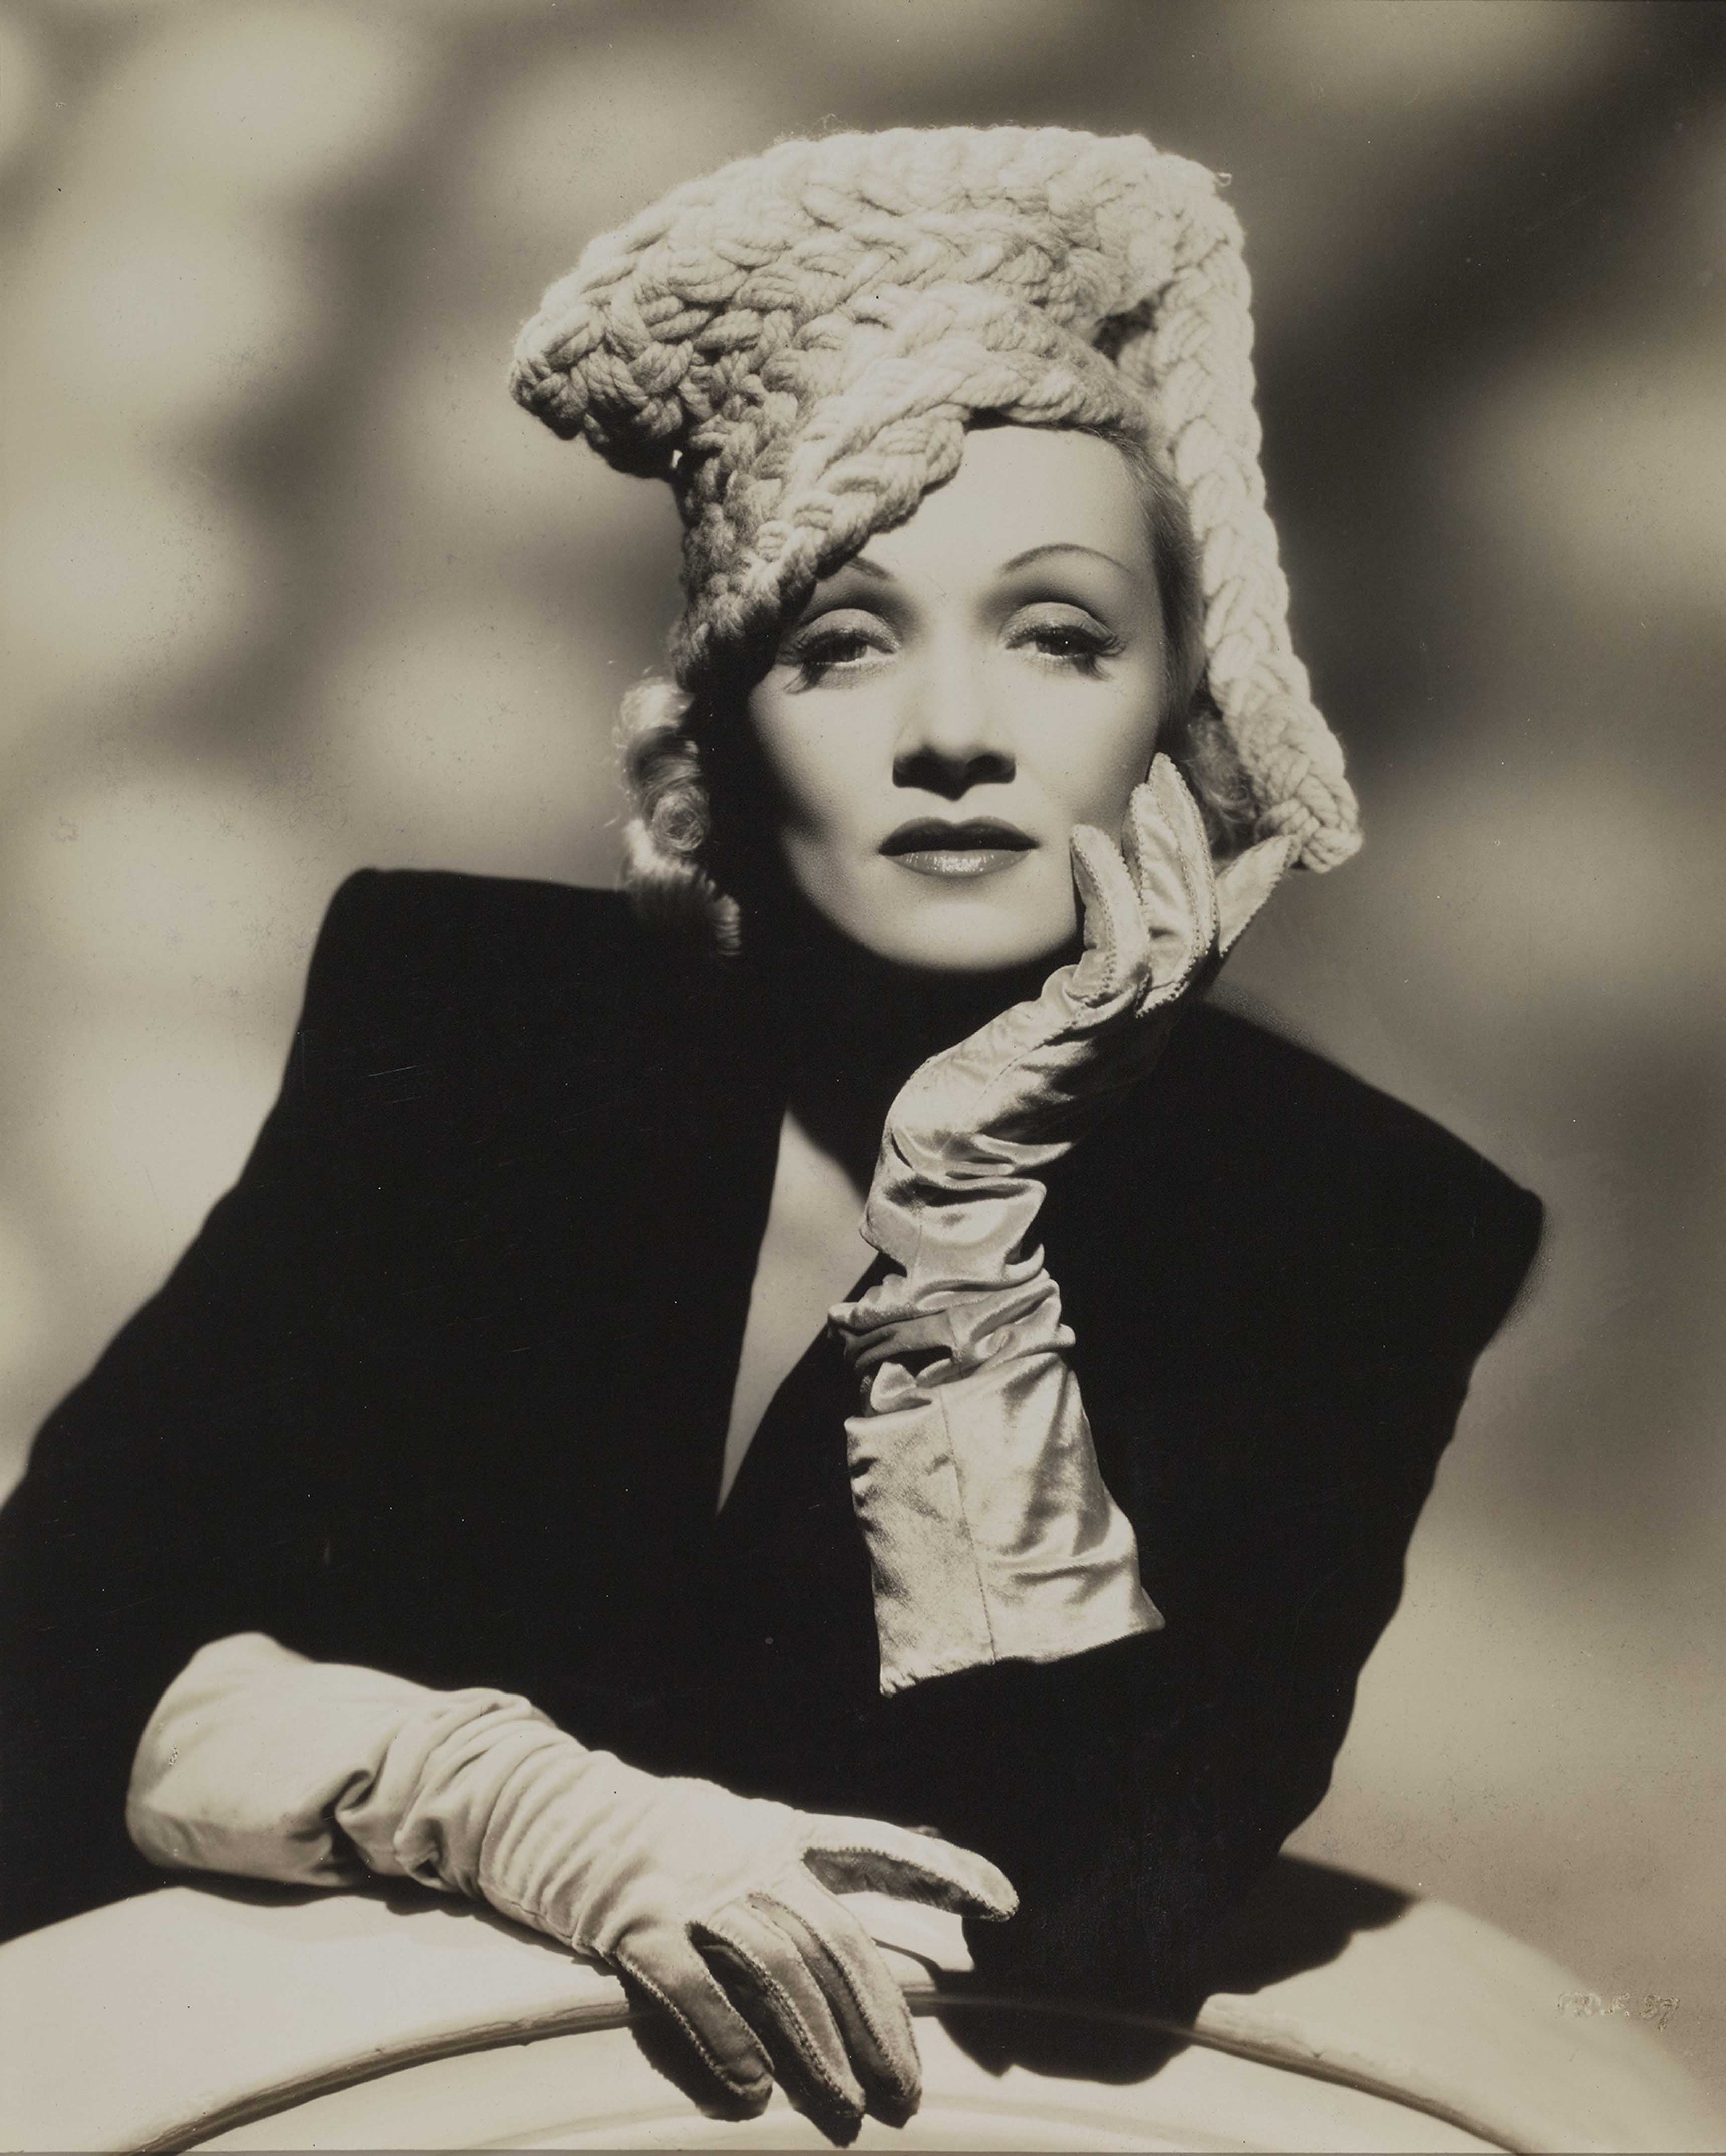 Ray Jones Marlene Dietrich, Pittsburgh, 1942 © Everett Collection/Bridgeman Images